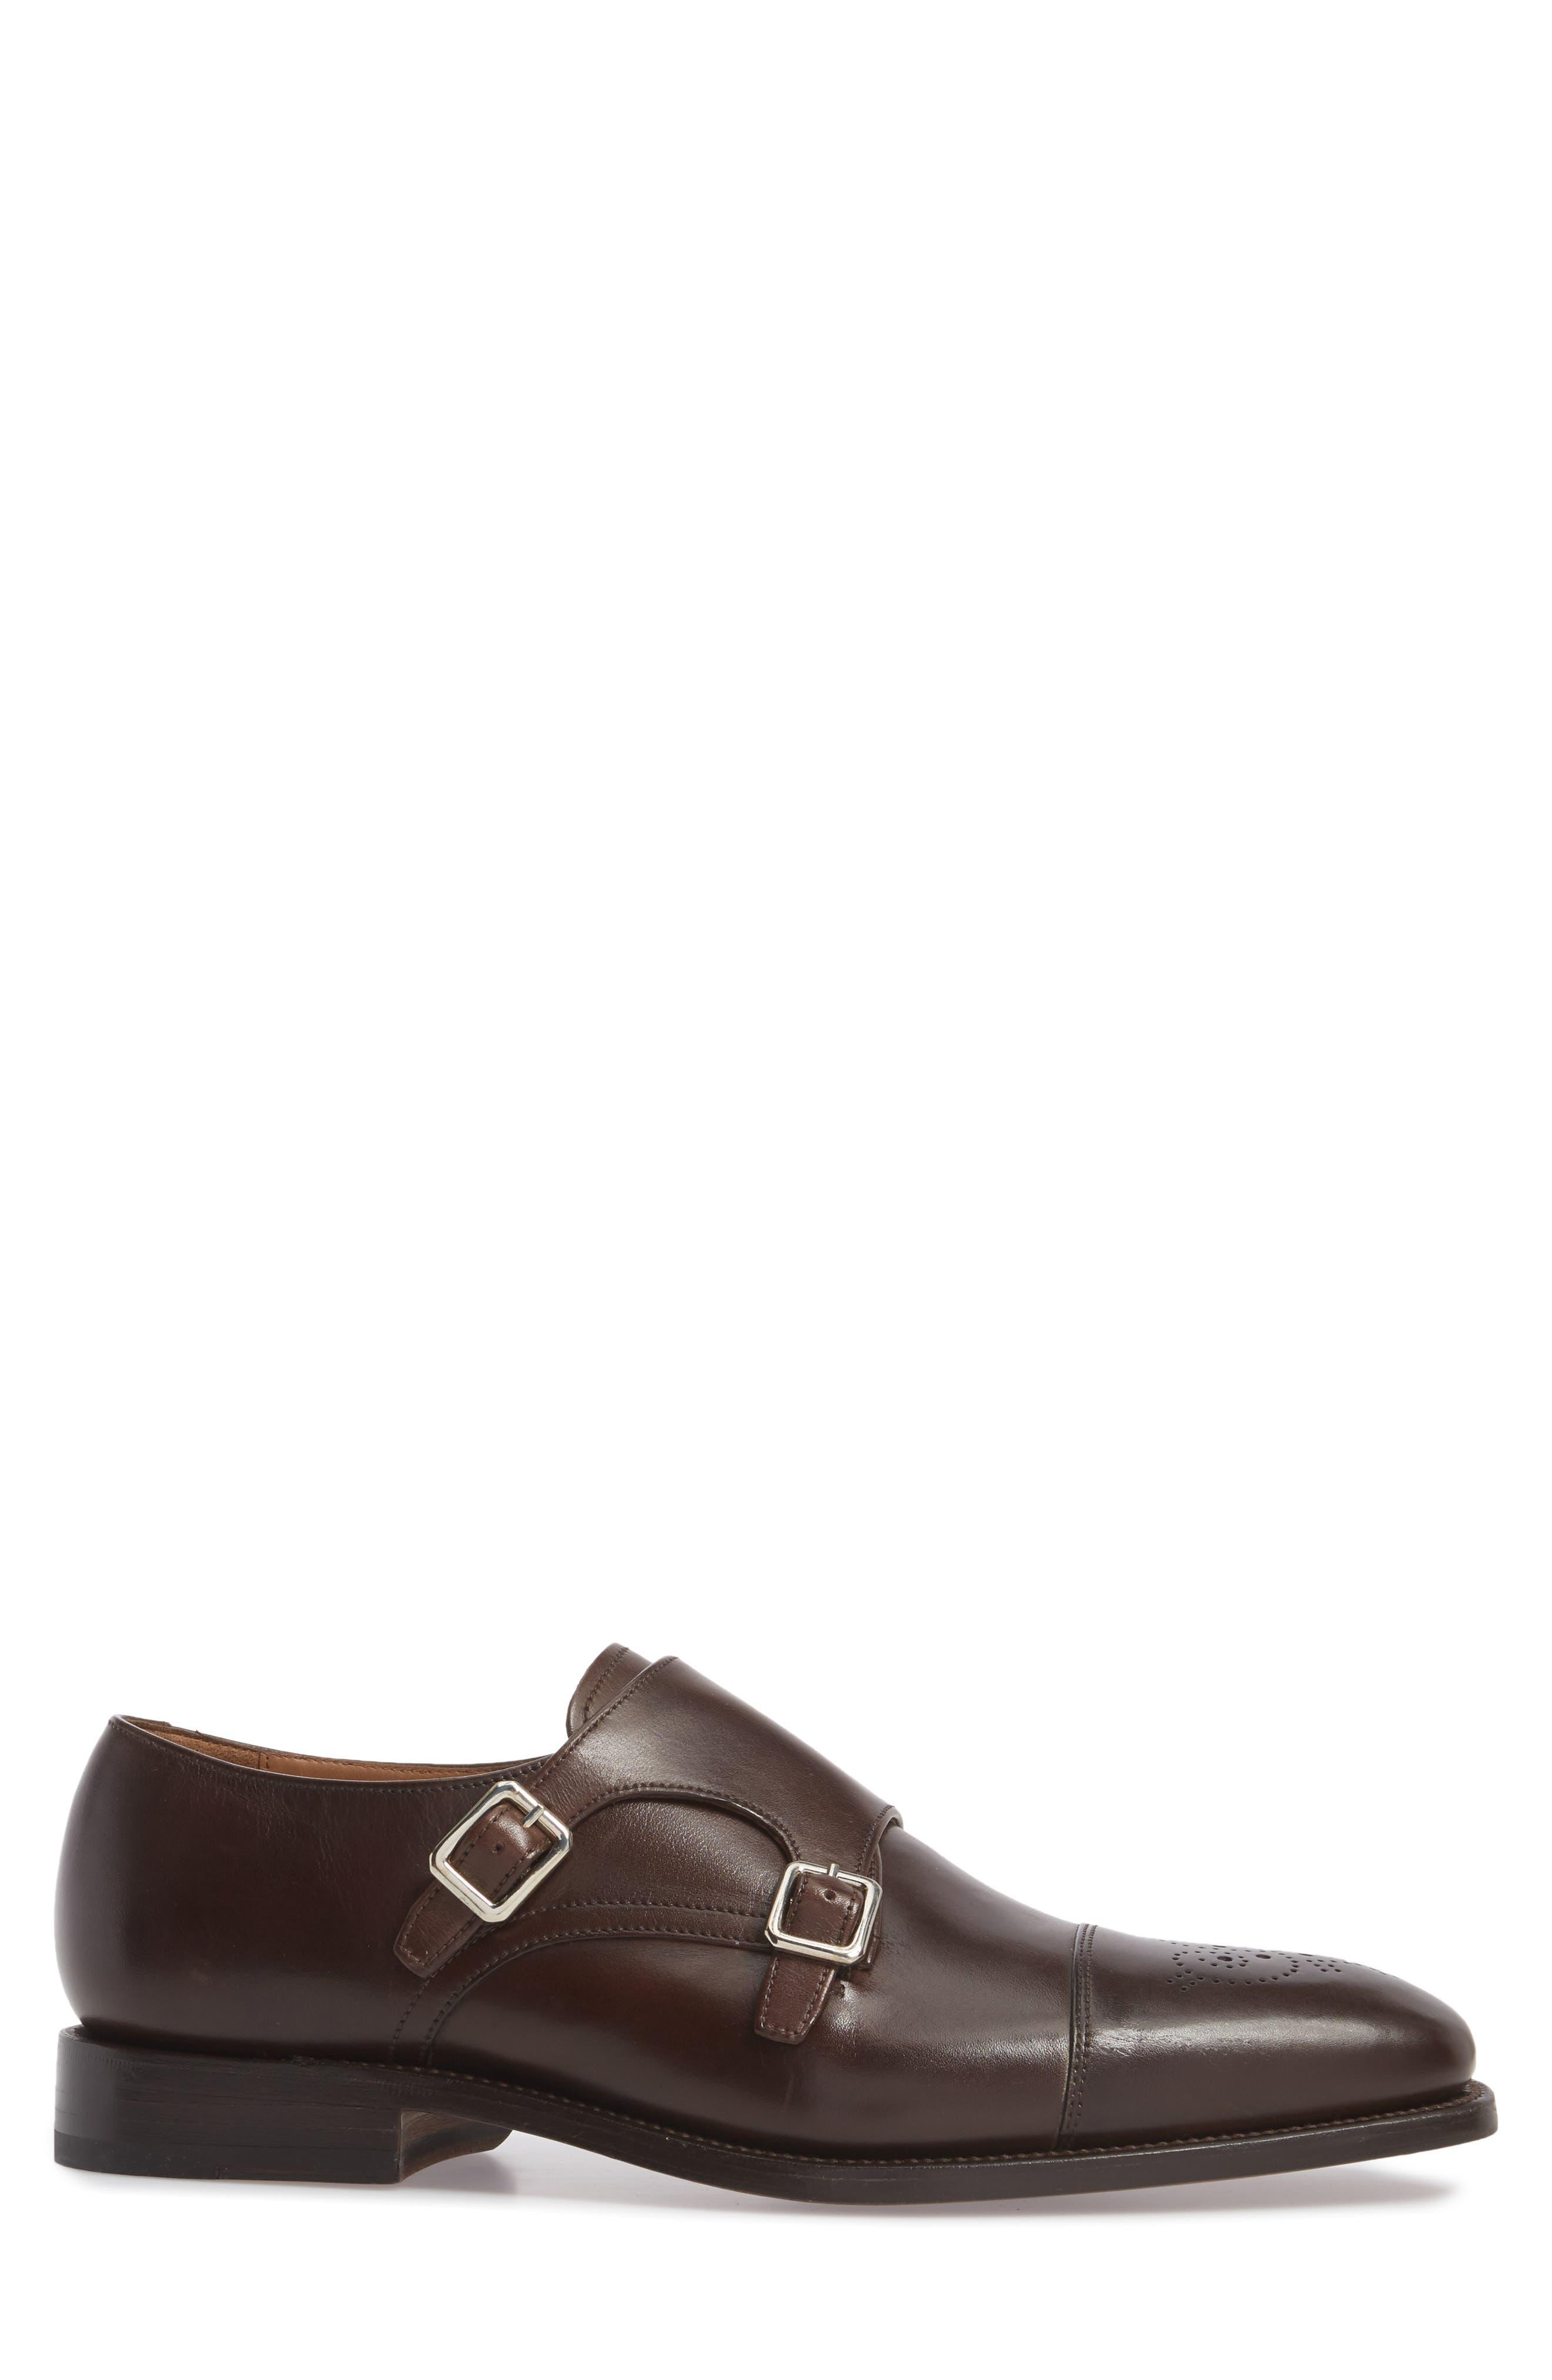 Sausalito Double Monk Strap Shoe,                             Alternate thumbnail 3, color,                             COFFEE